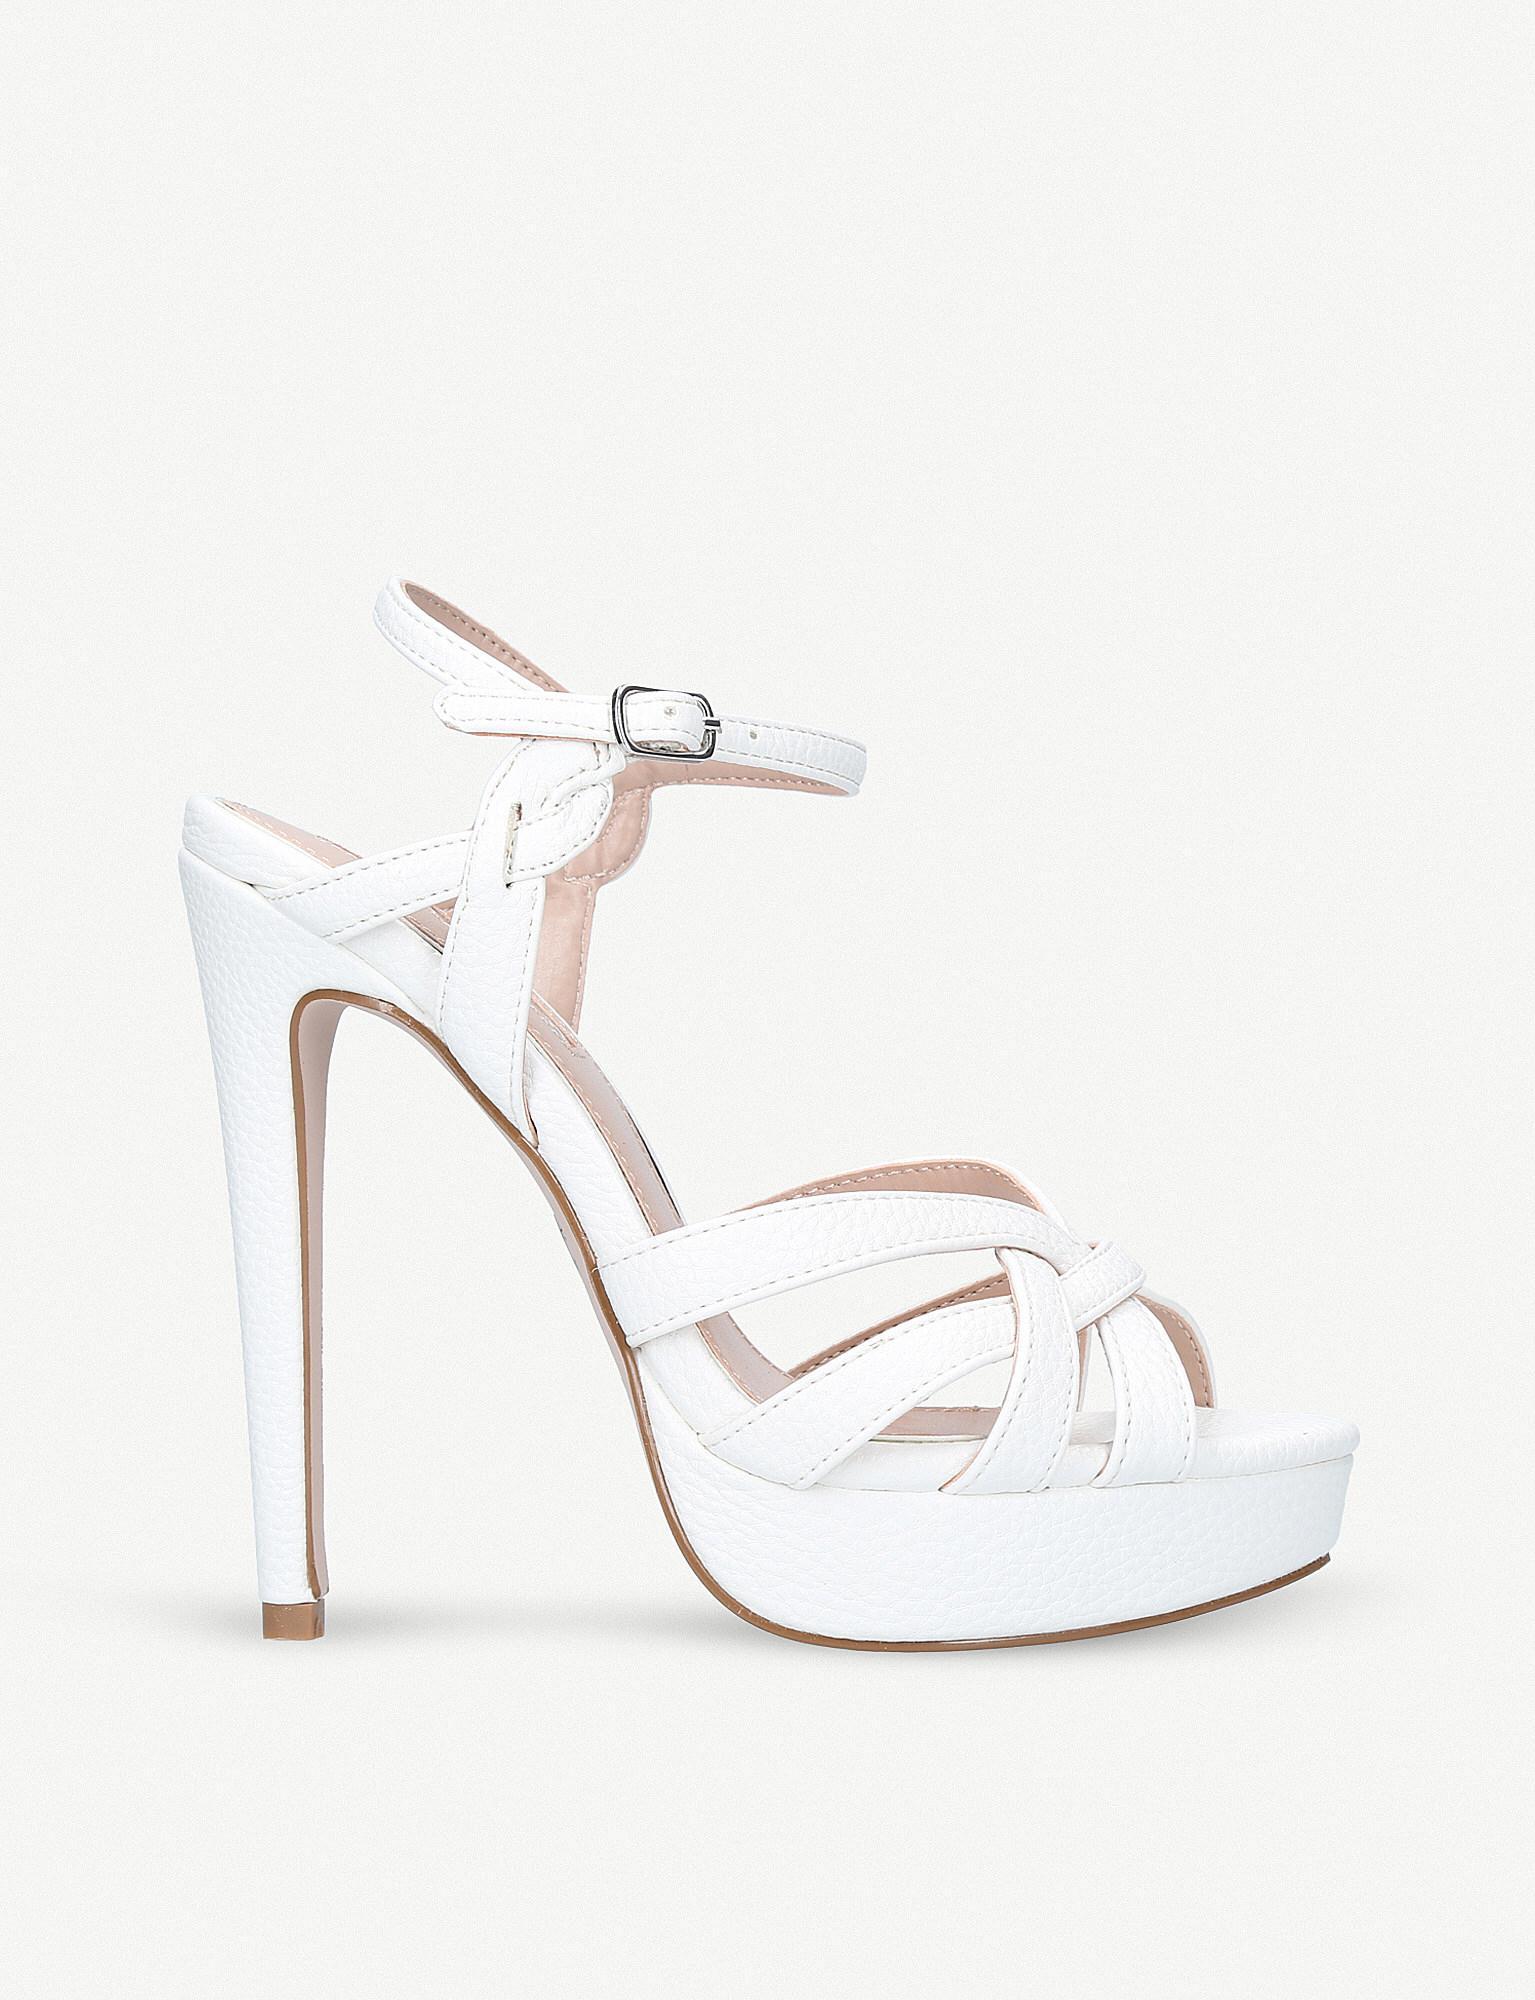 fdb11c5bb9ad Lyst - Miss Kg Samia Platform Sandals in White